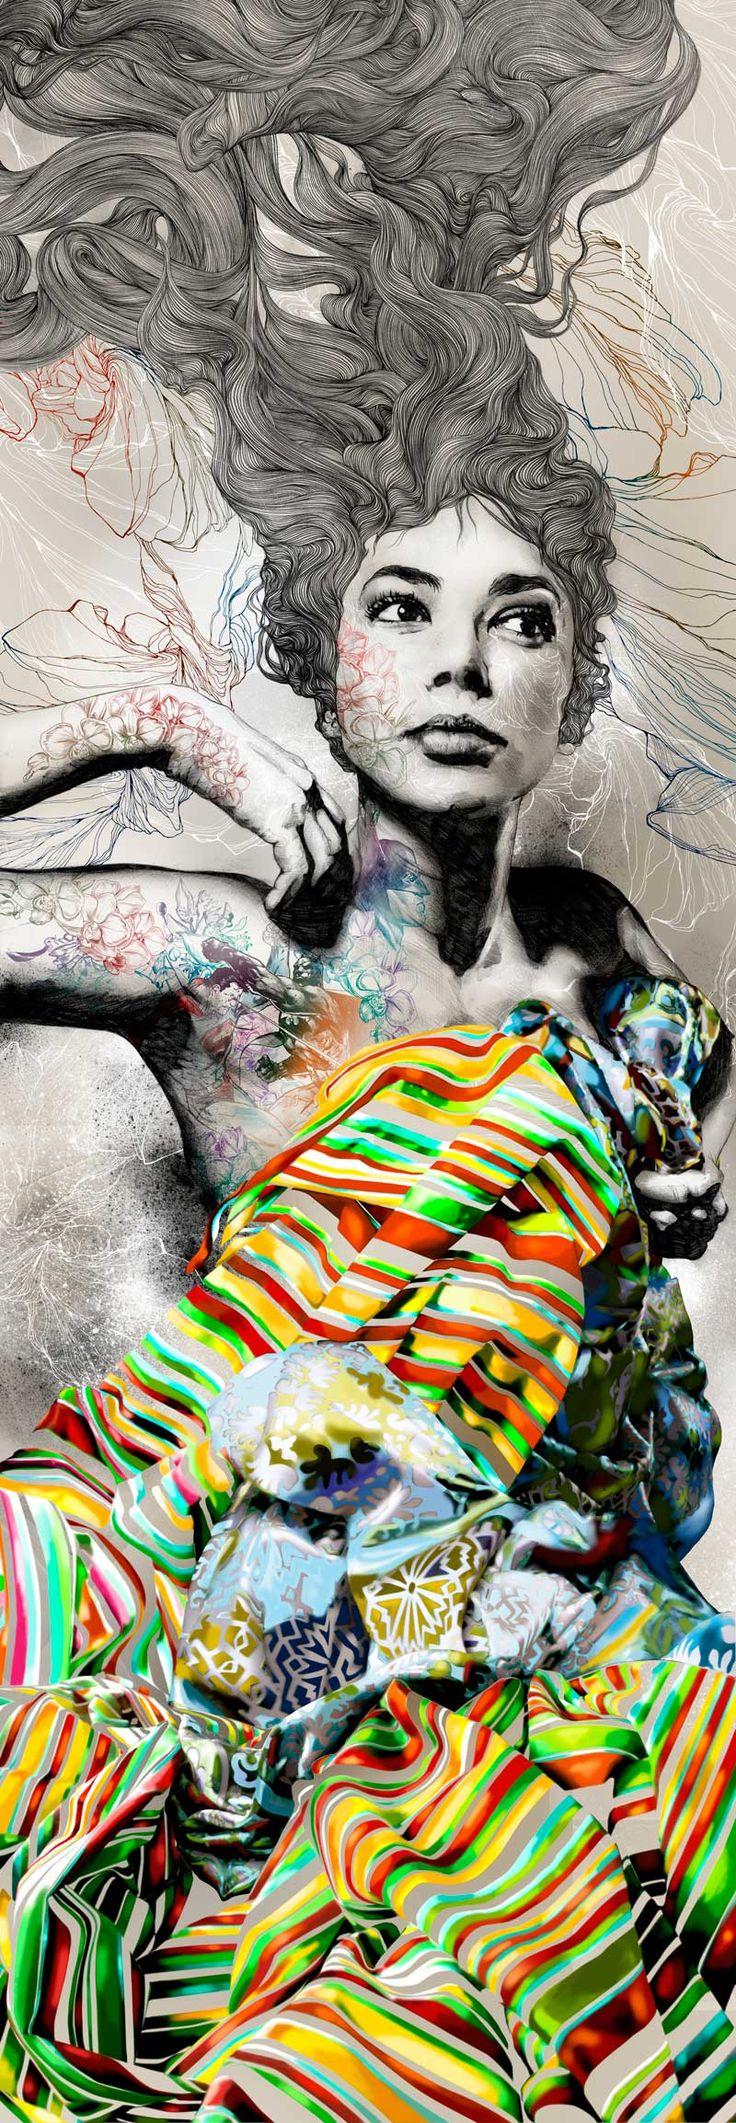 Elena - Etching by Madrid based artist Gabriel Moreno